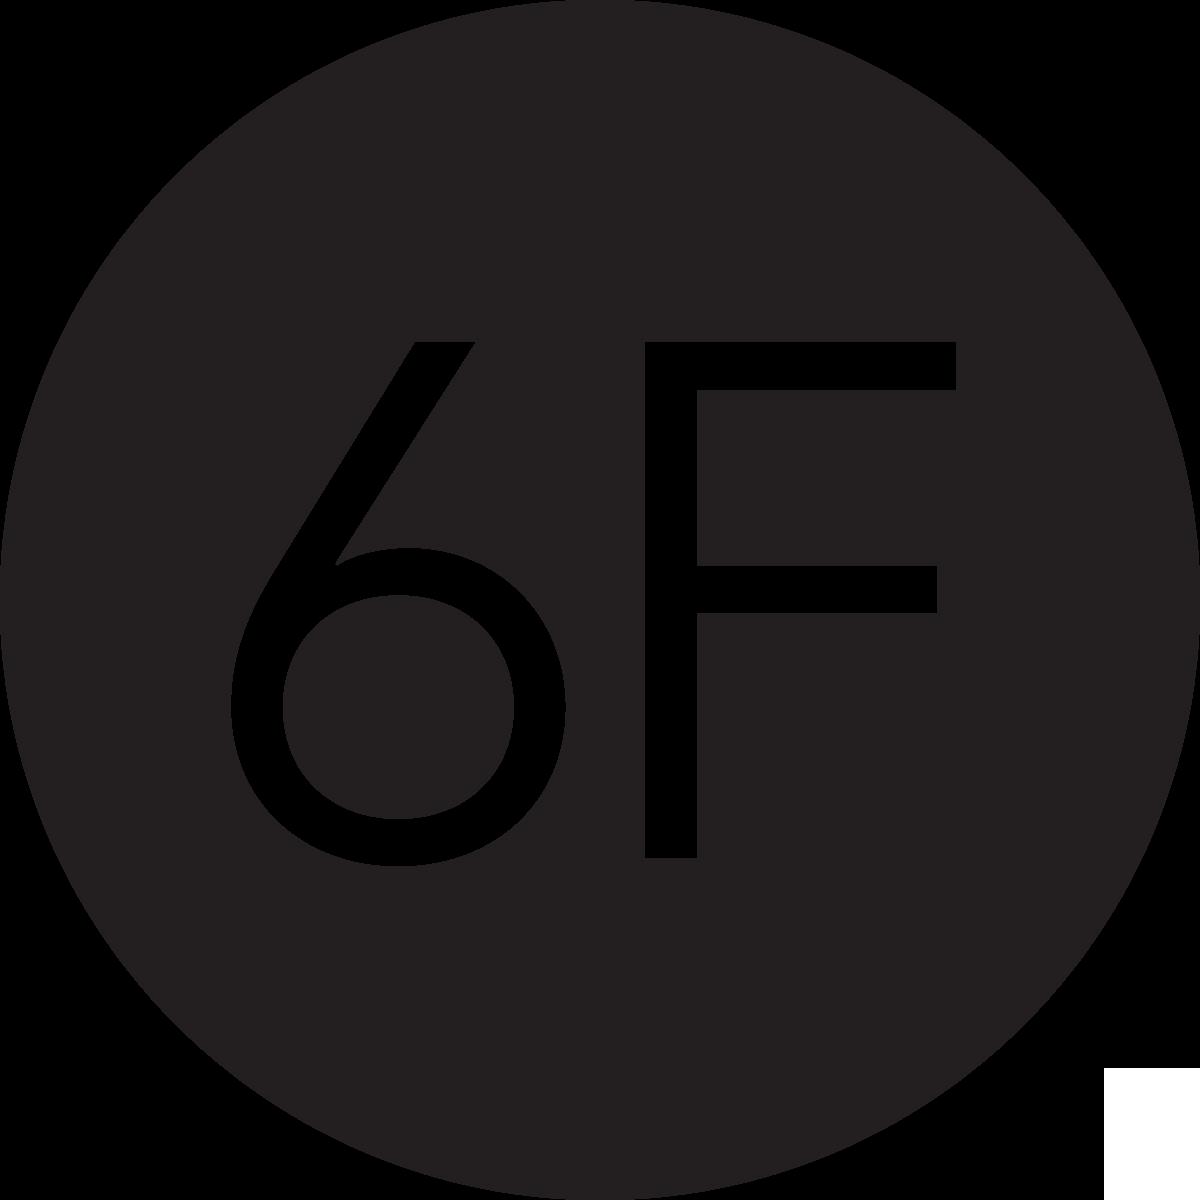 6F_logo_black.PNG